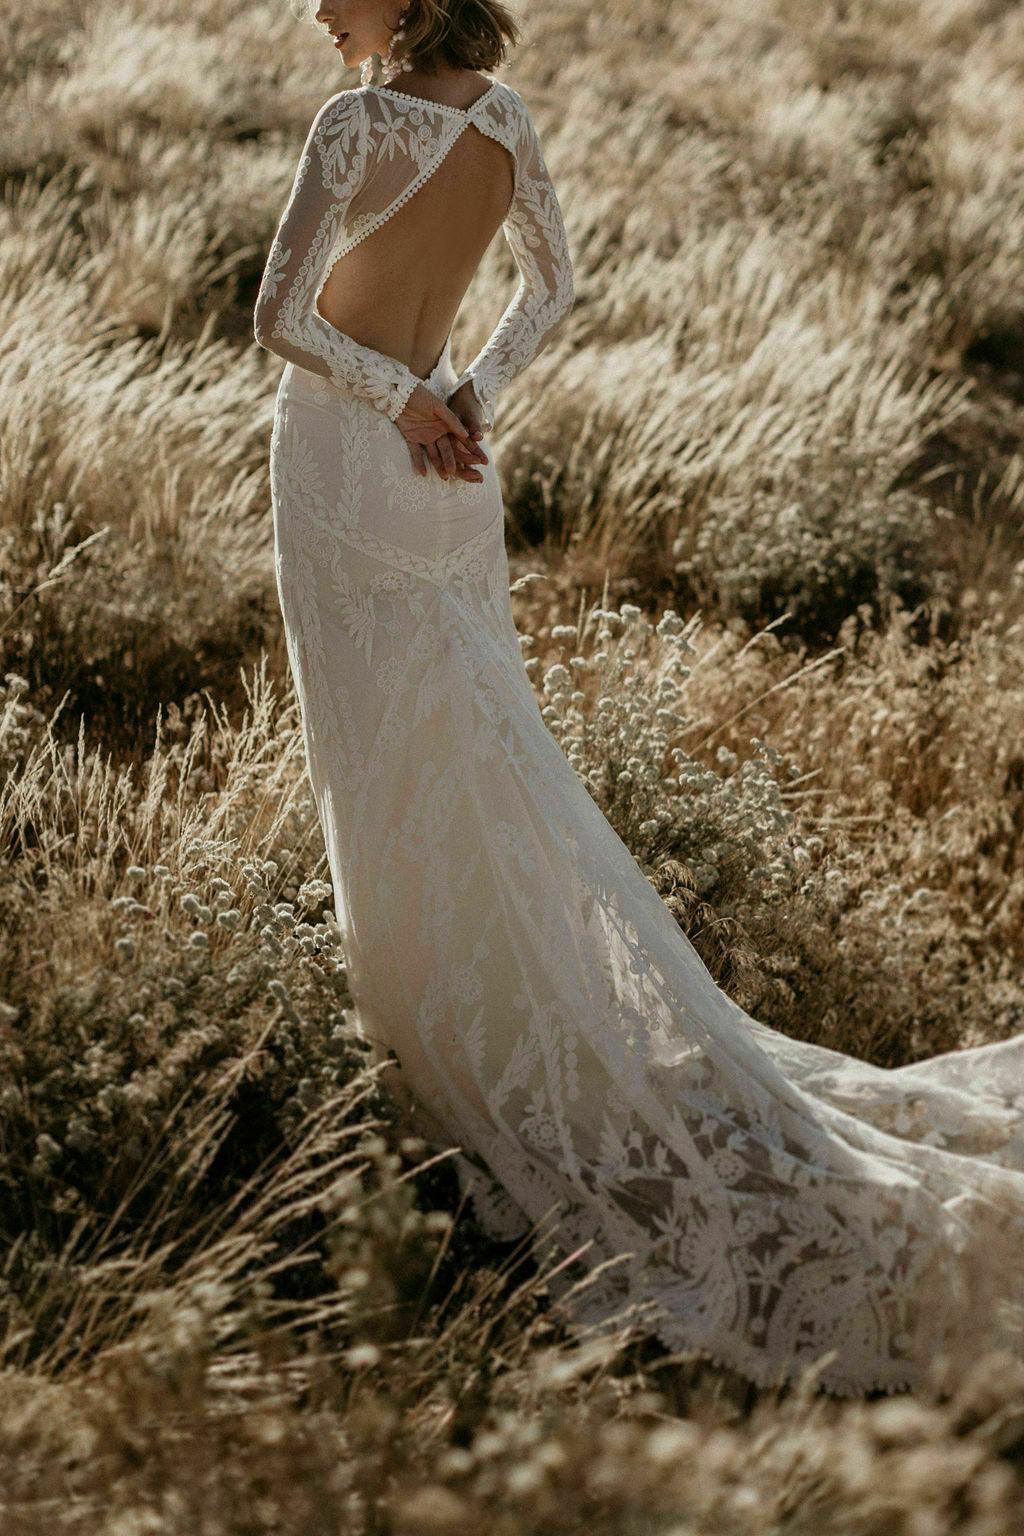 Violetta Backless Boho Wedding Dress